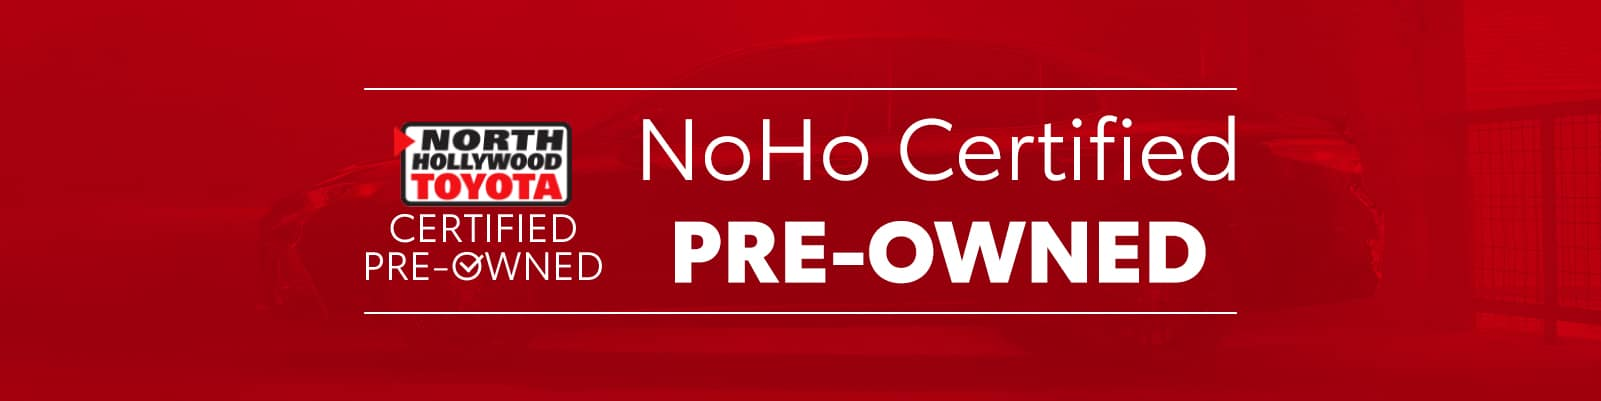 Browse NoHo CPO Inventory